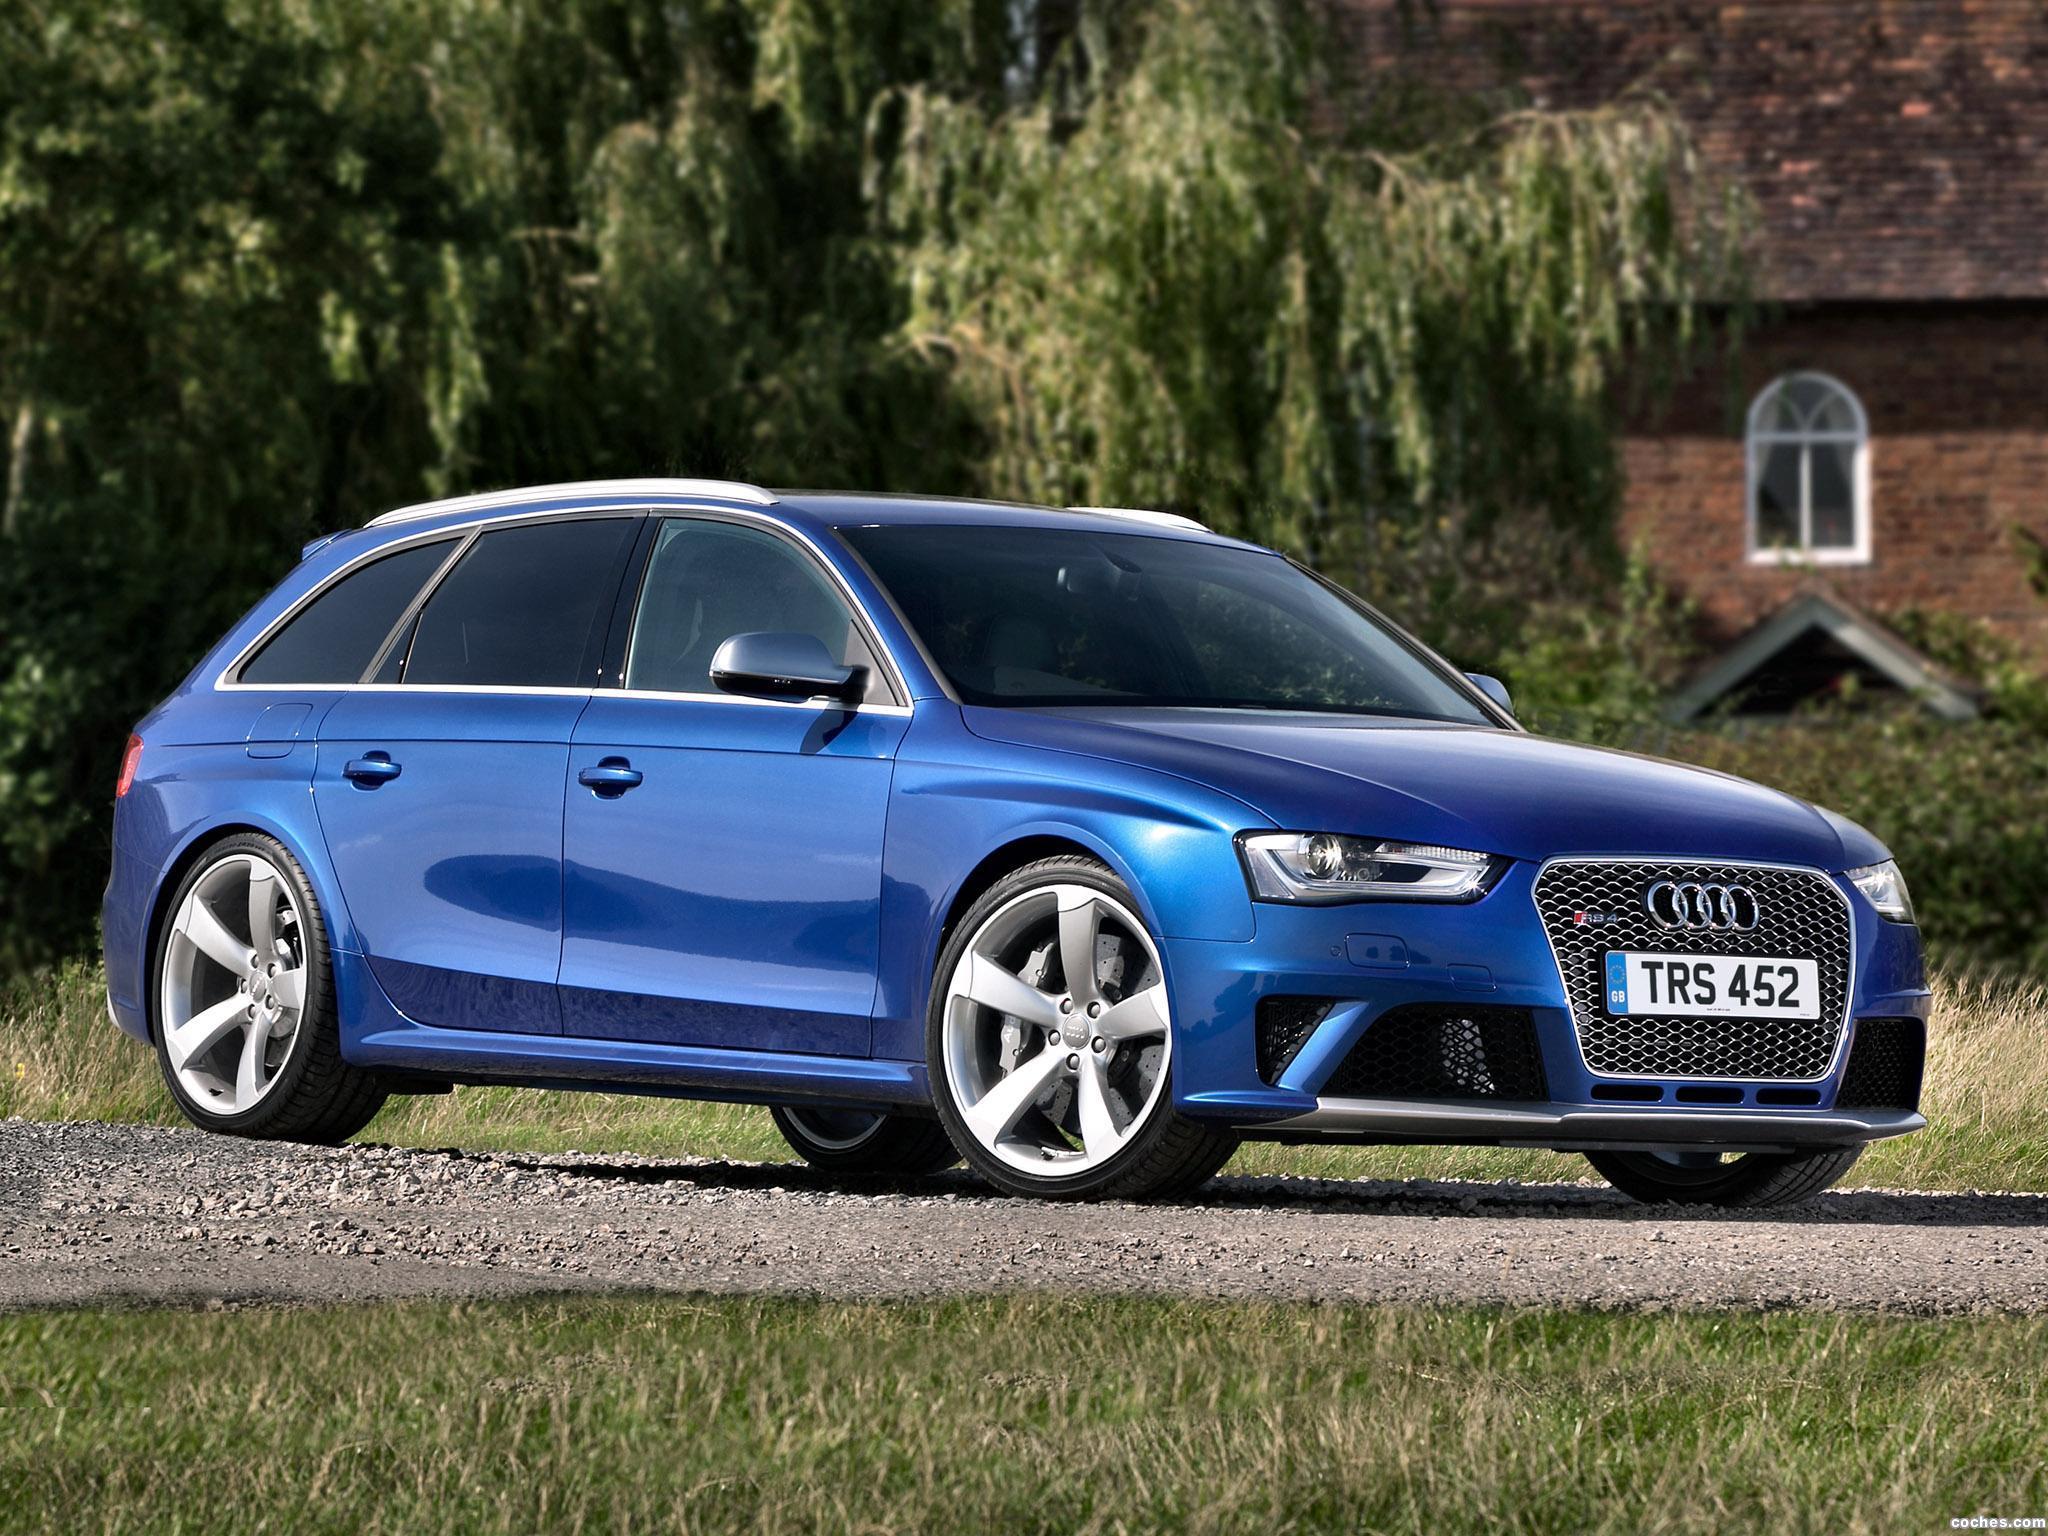 Foto 0 de Audi RS4 Avant UK 2013